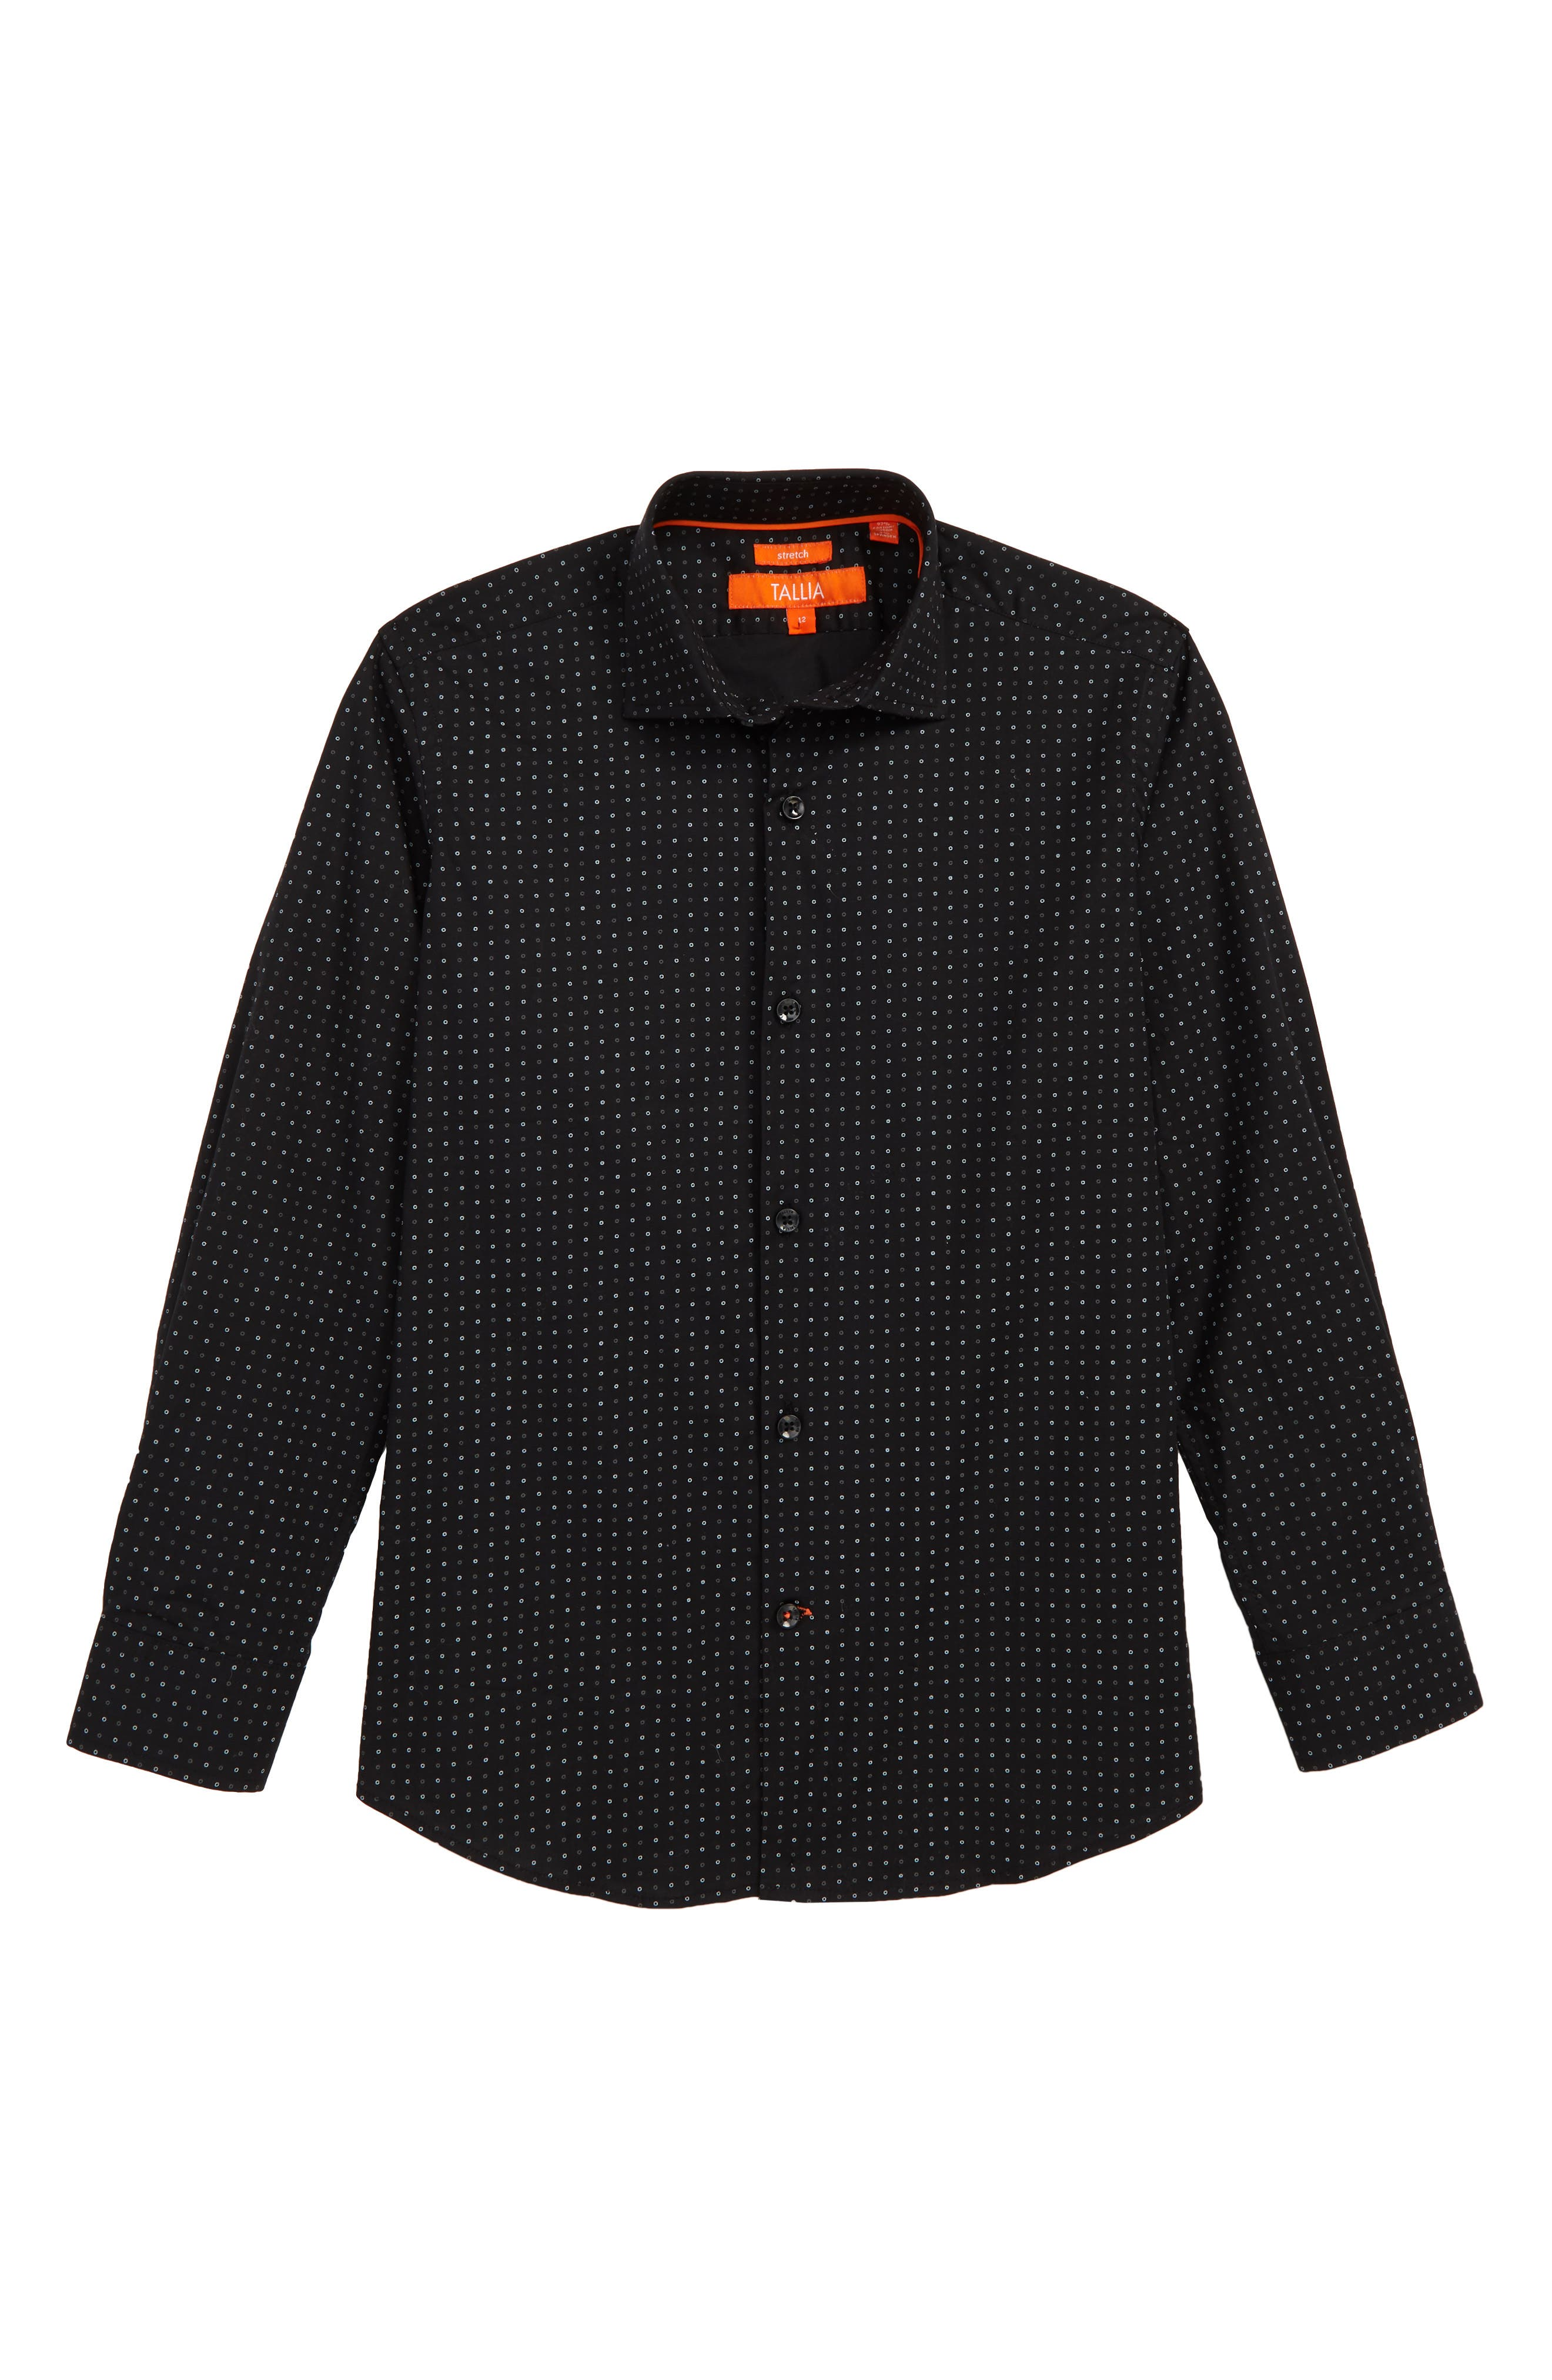 Dot Dress Shirt,                             Main thumbnail 1, color,                             BLACK